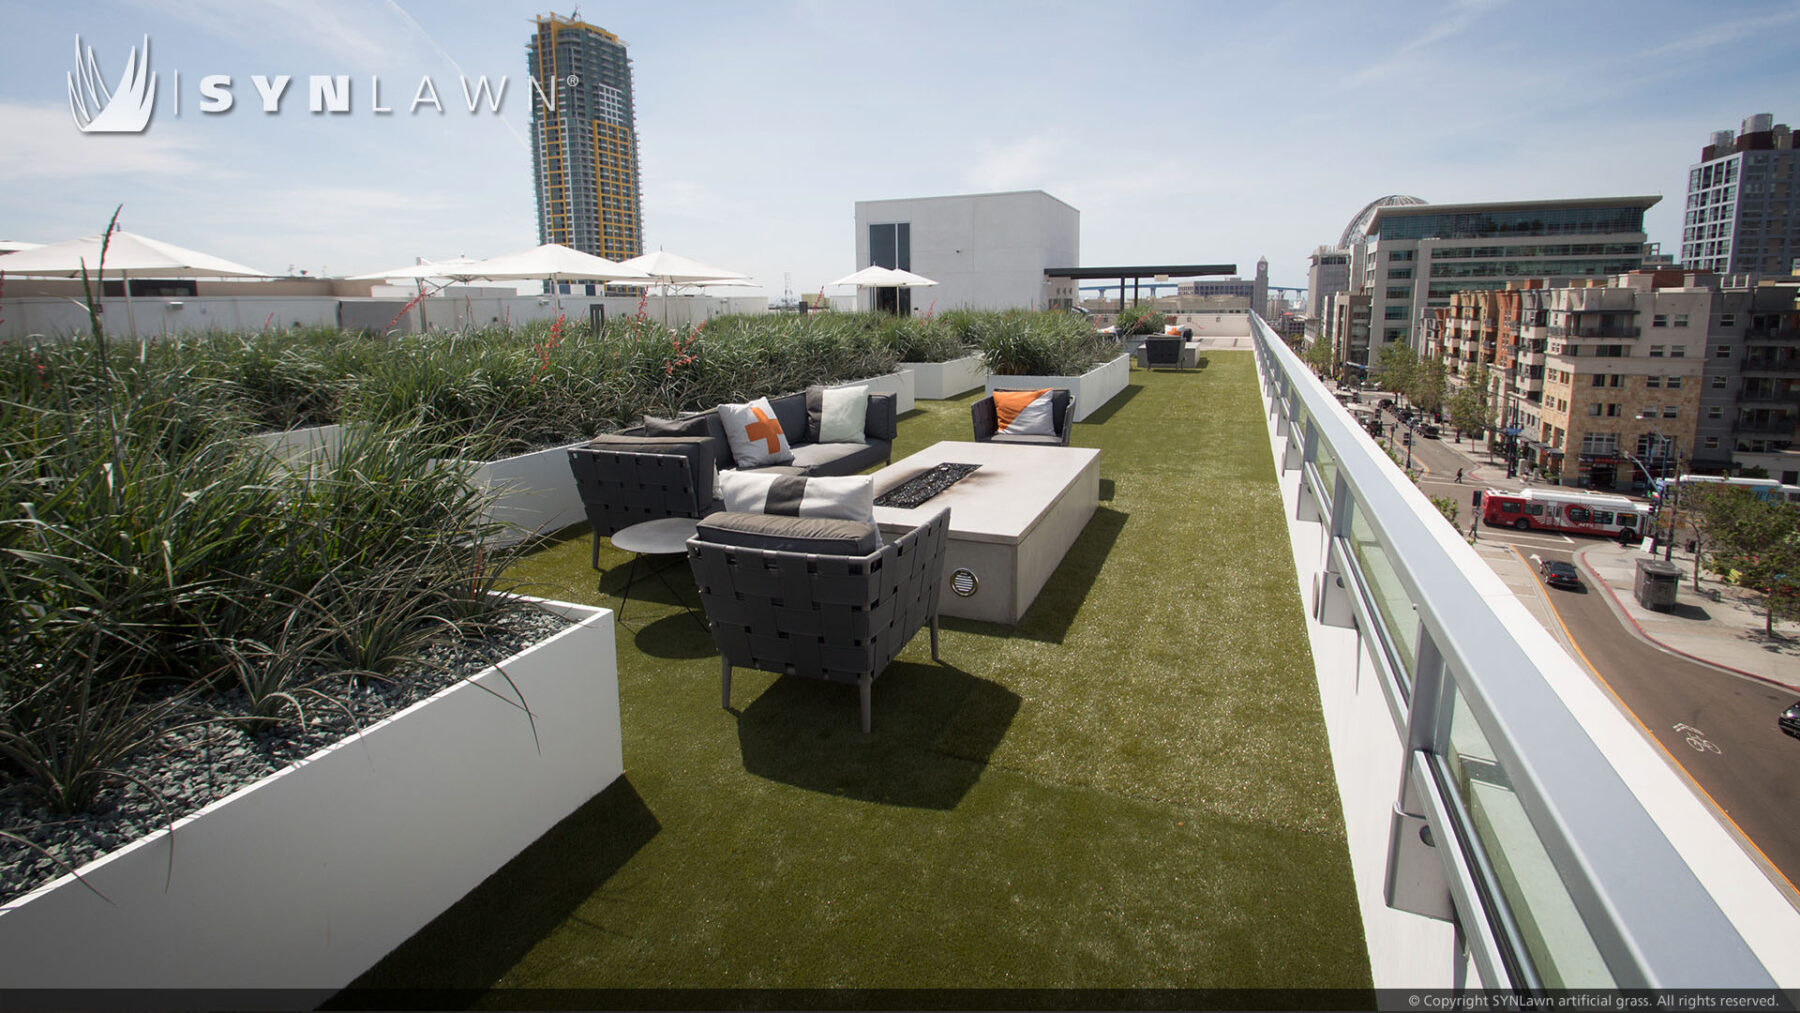 rooftop turf, artificial grass installation